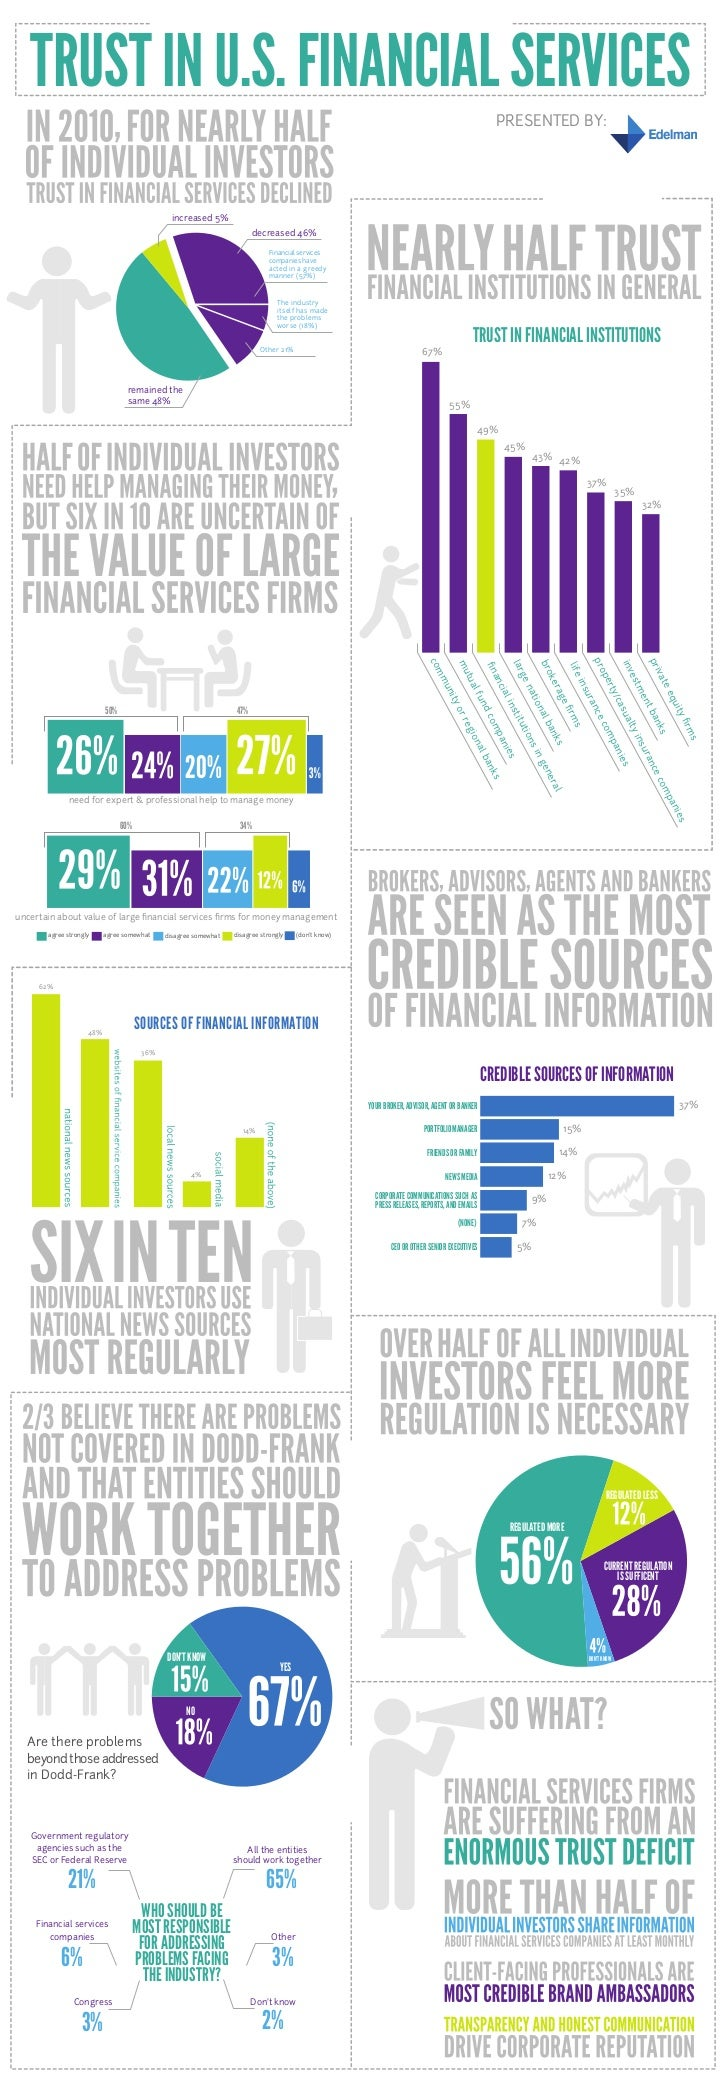 2011 Edelman Trust in U.S. Financial Services Infographic